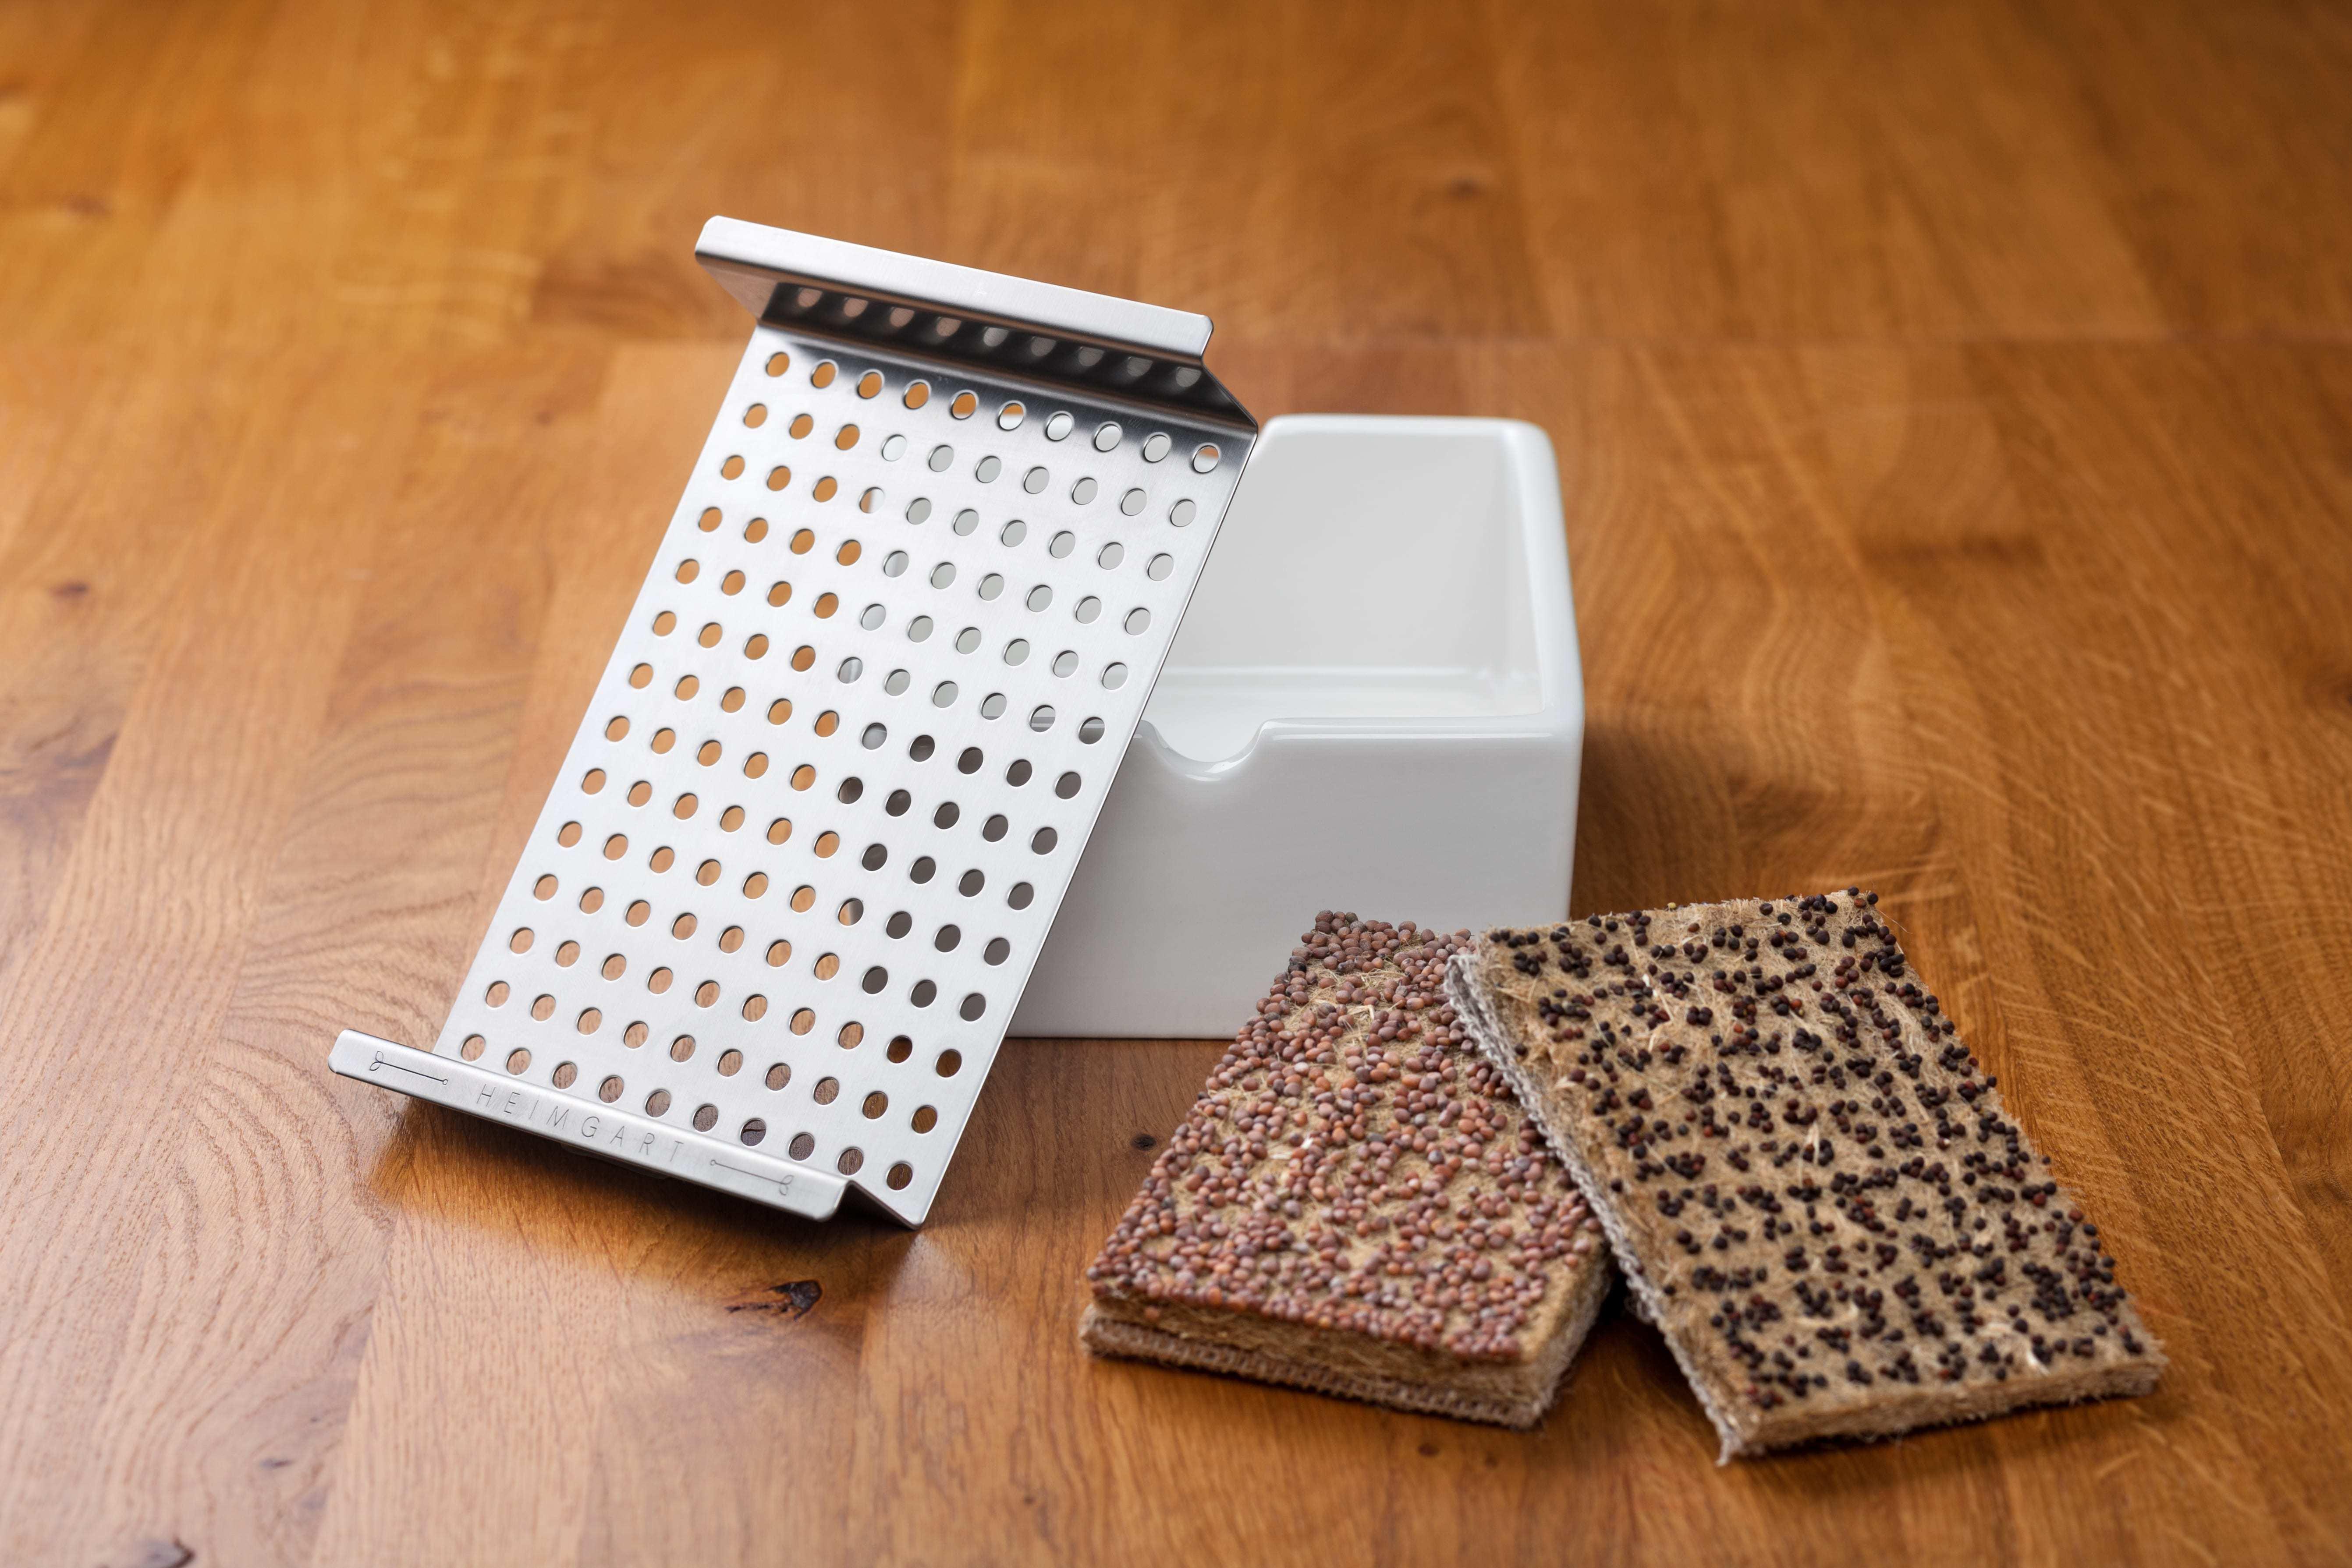 Microgreens von HeimgartHeimgart Hardware - Keimschale, Saatpad & Gitter